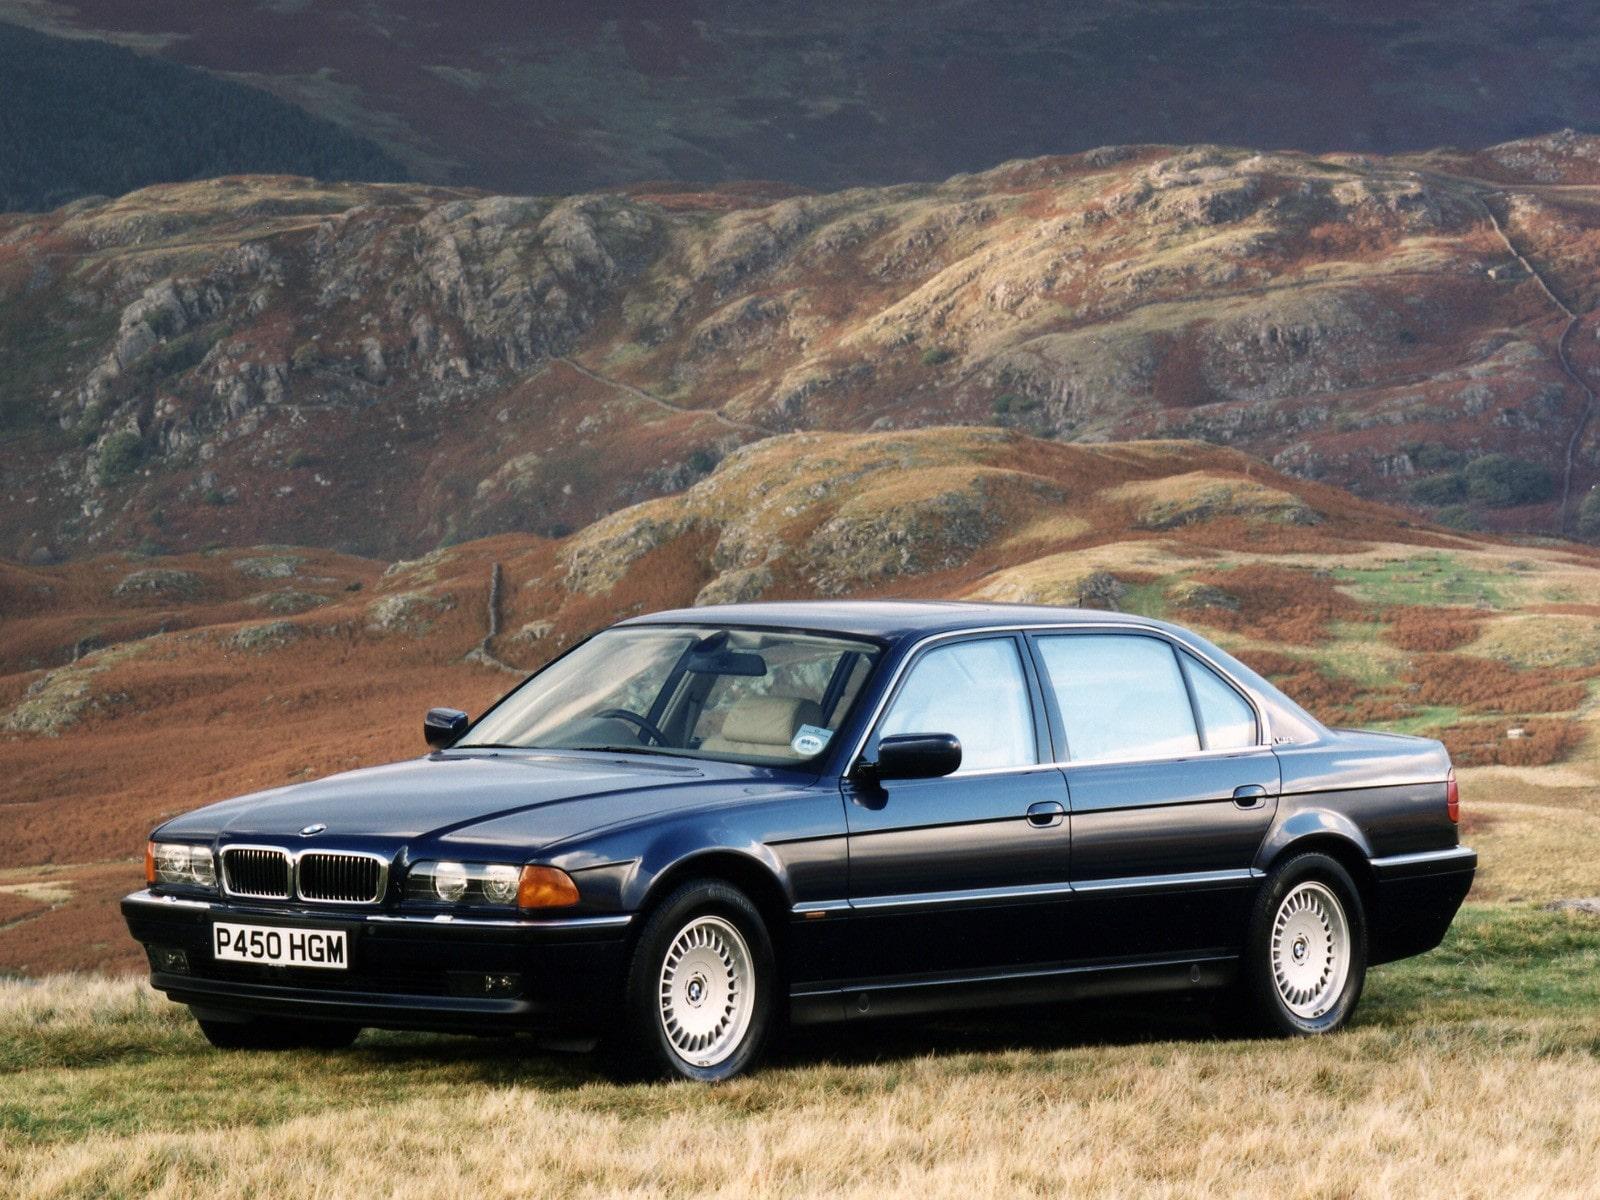 1995 BMW 7 Series Free